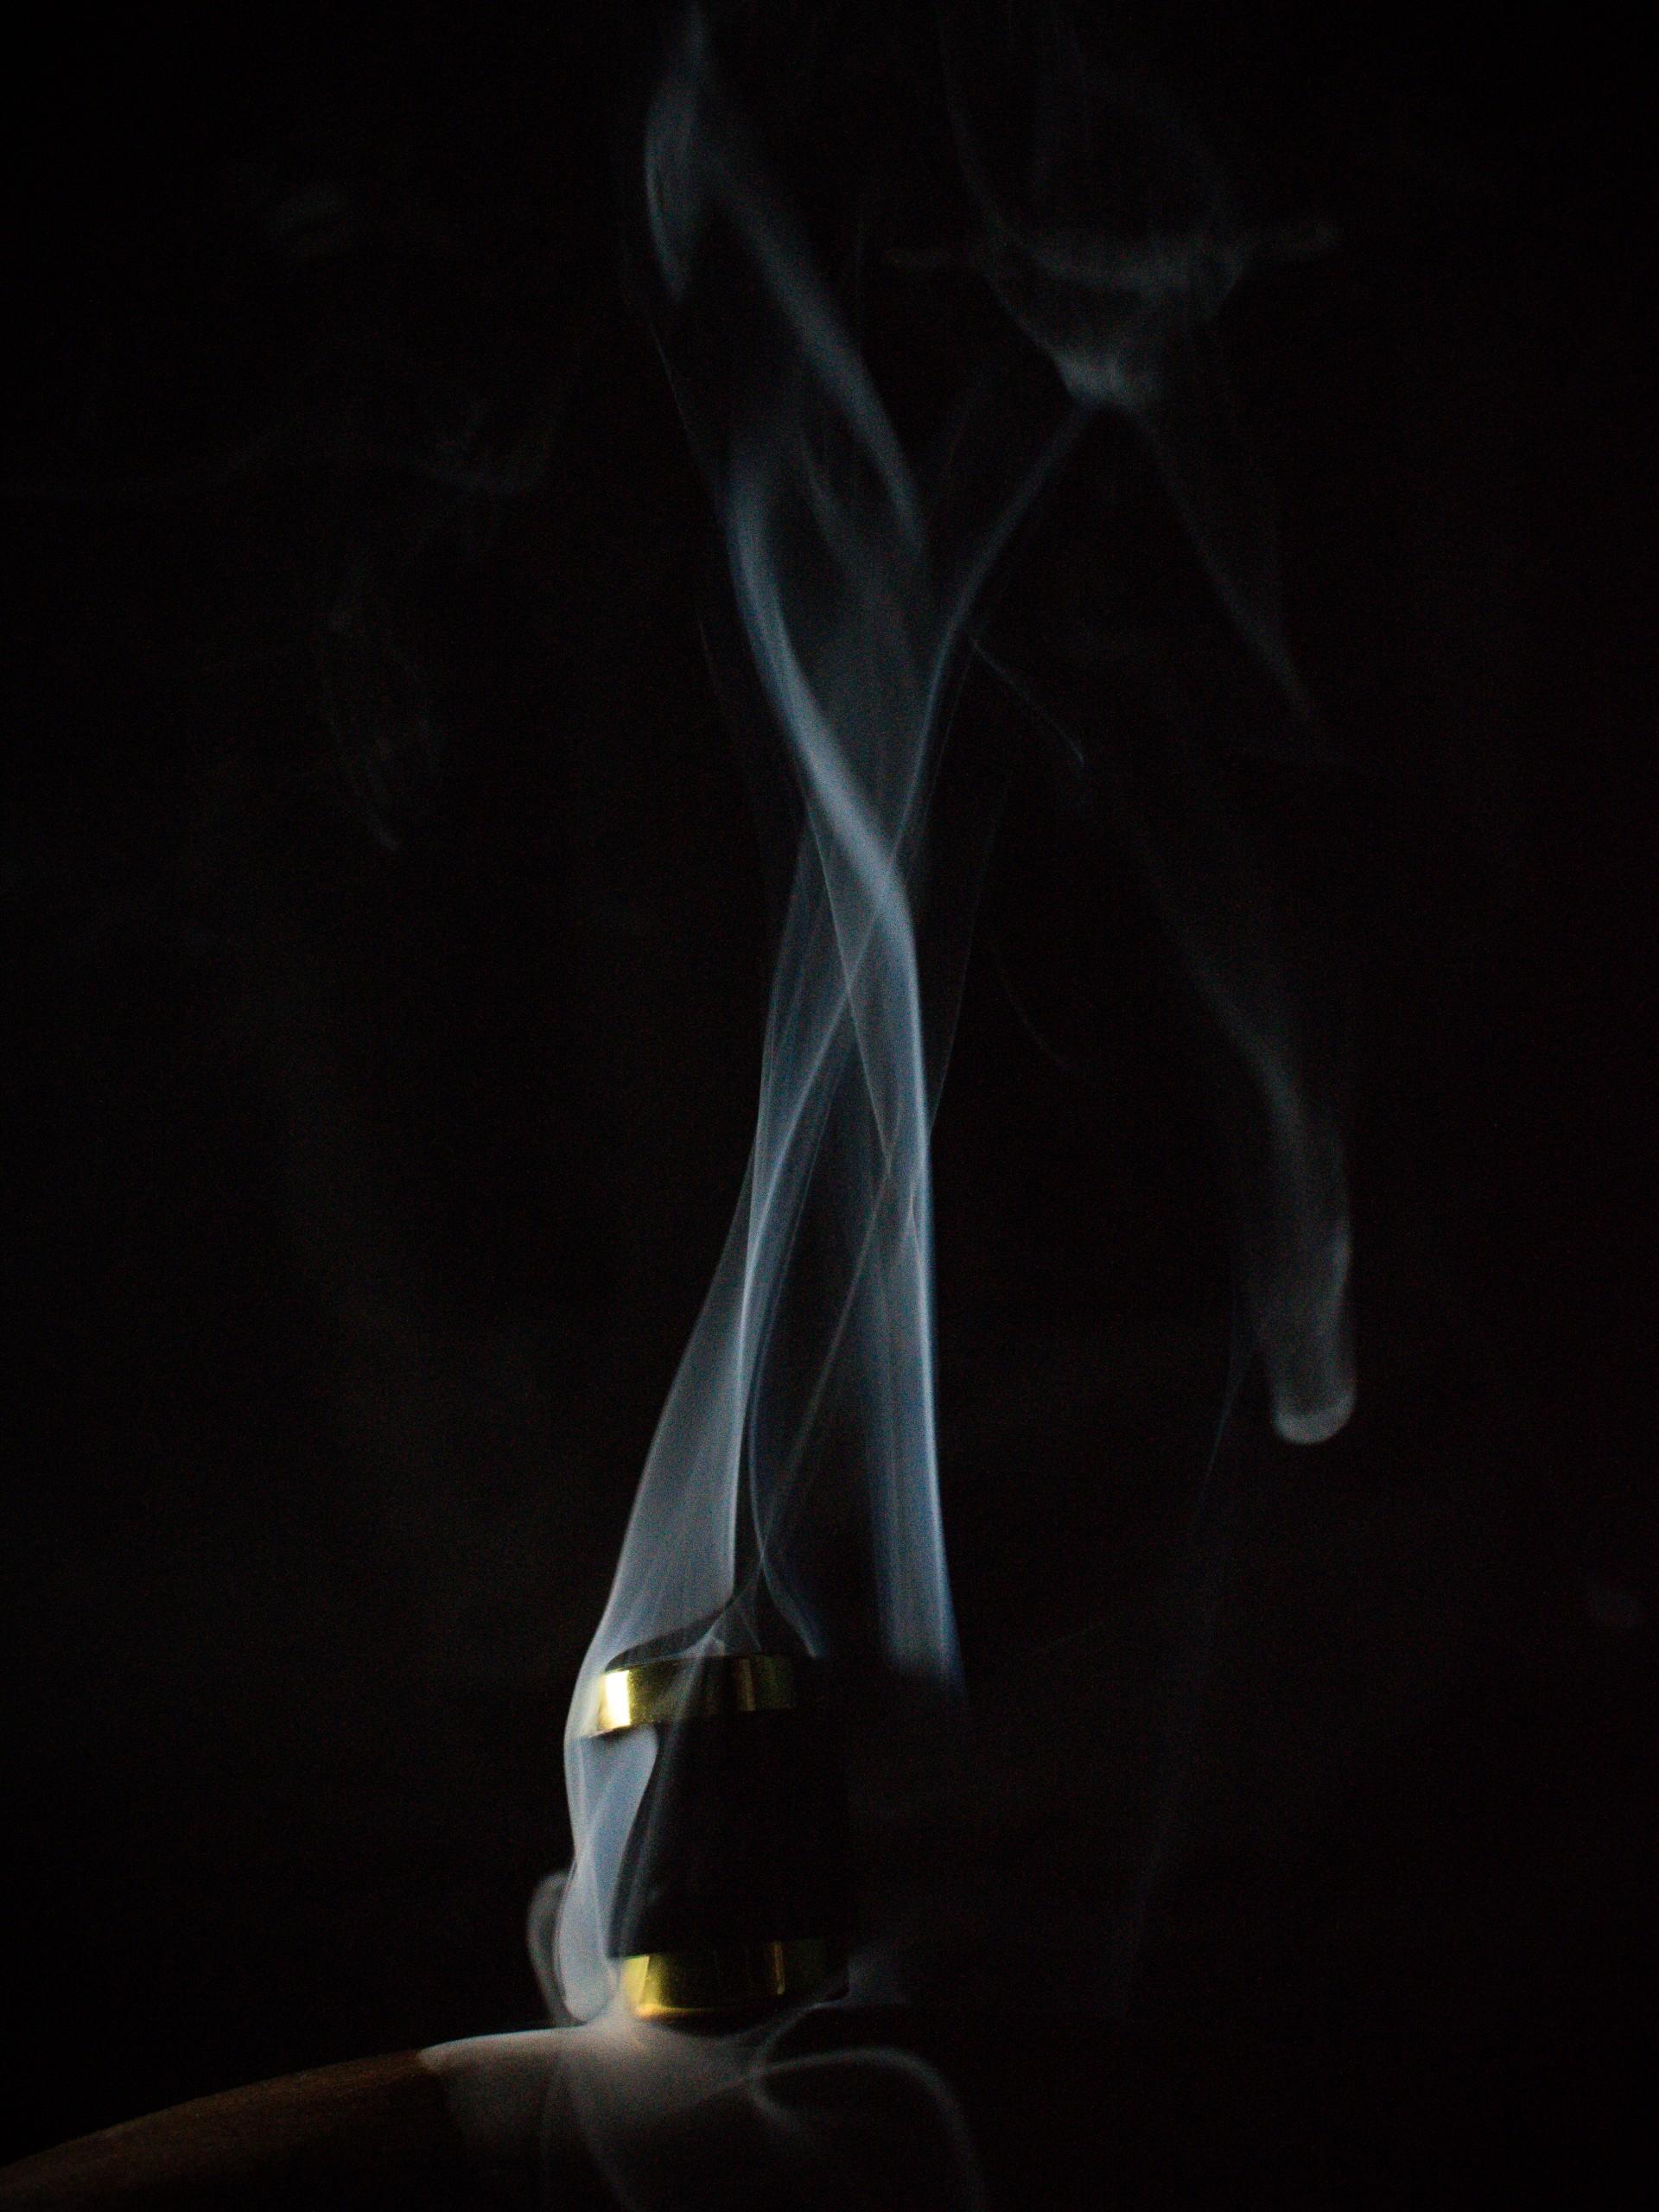 Smoke in darkness